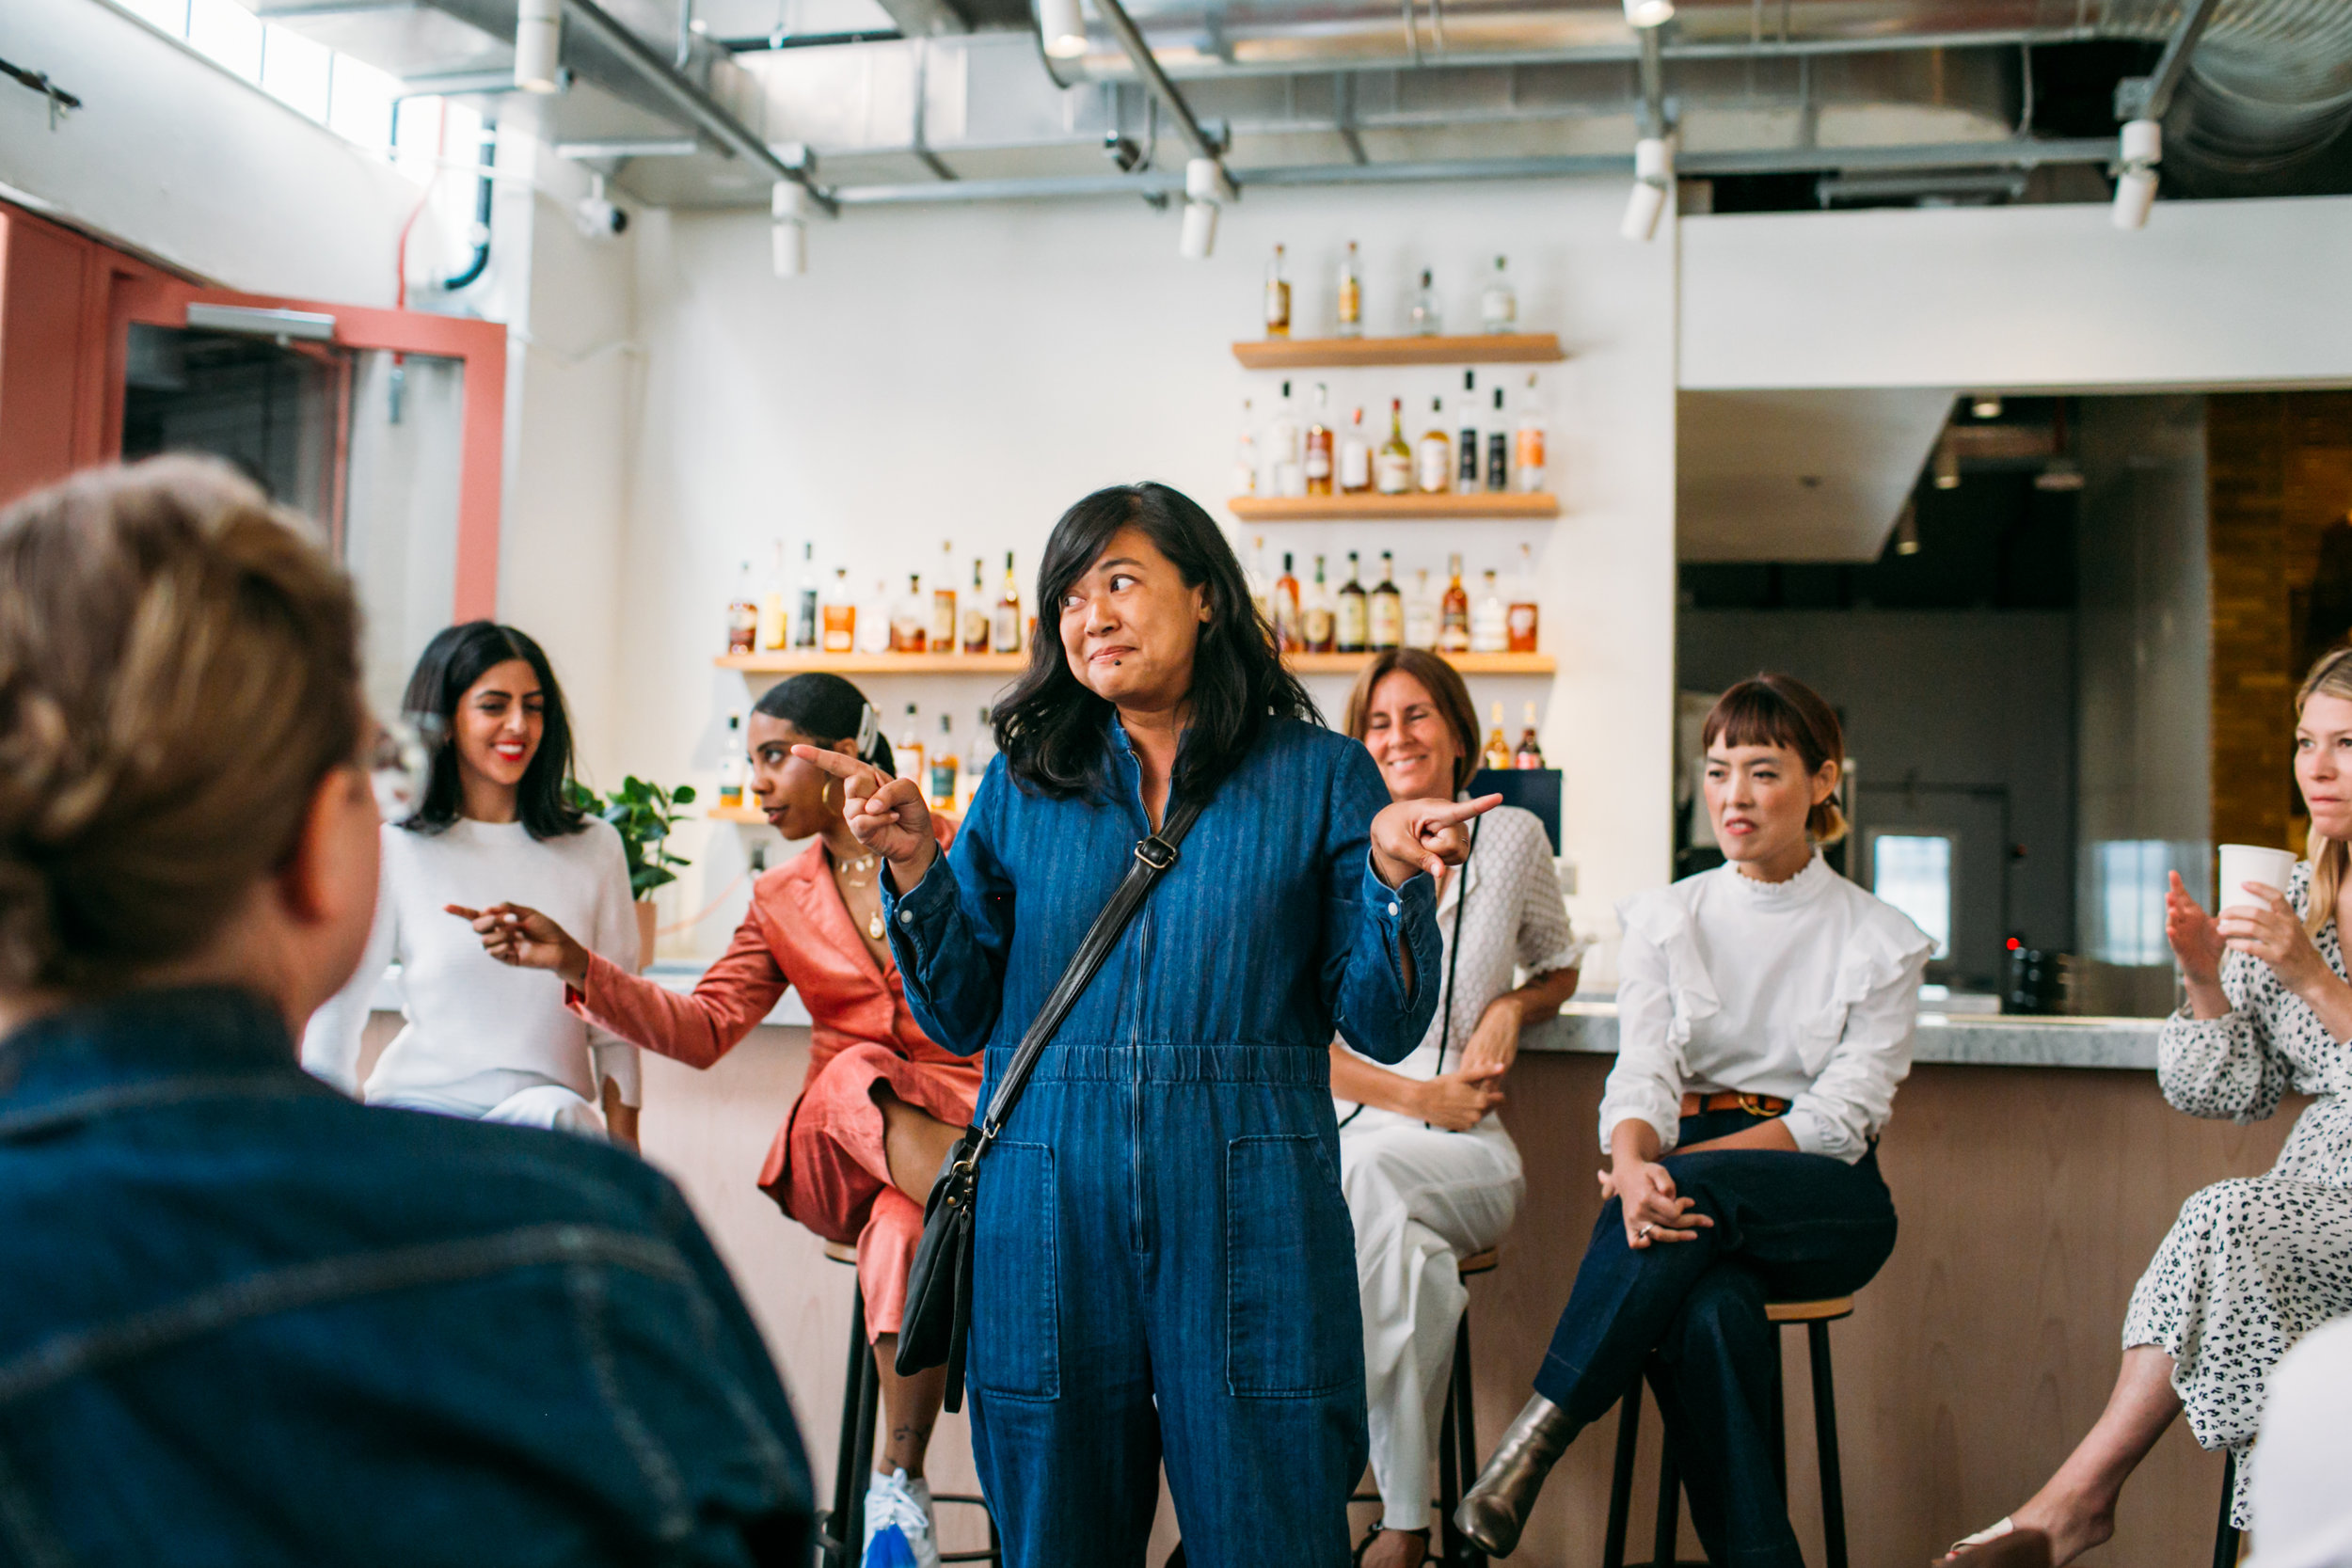 LA Design Festival Founder, Haily Zaki